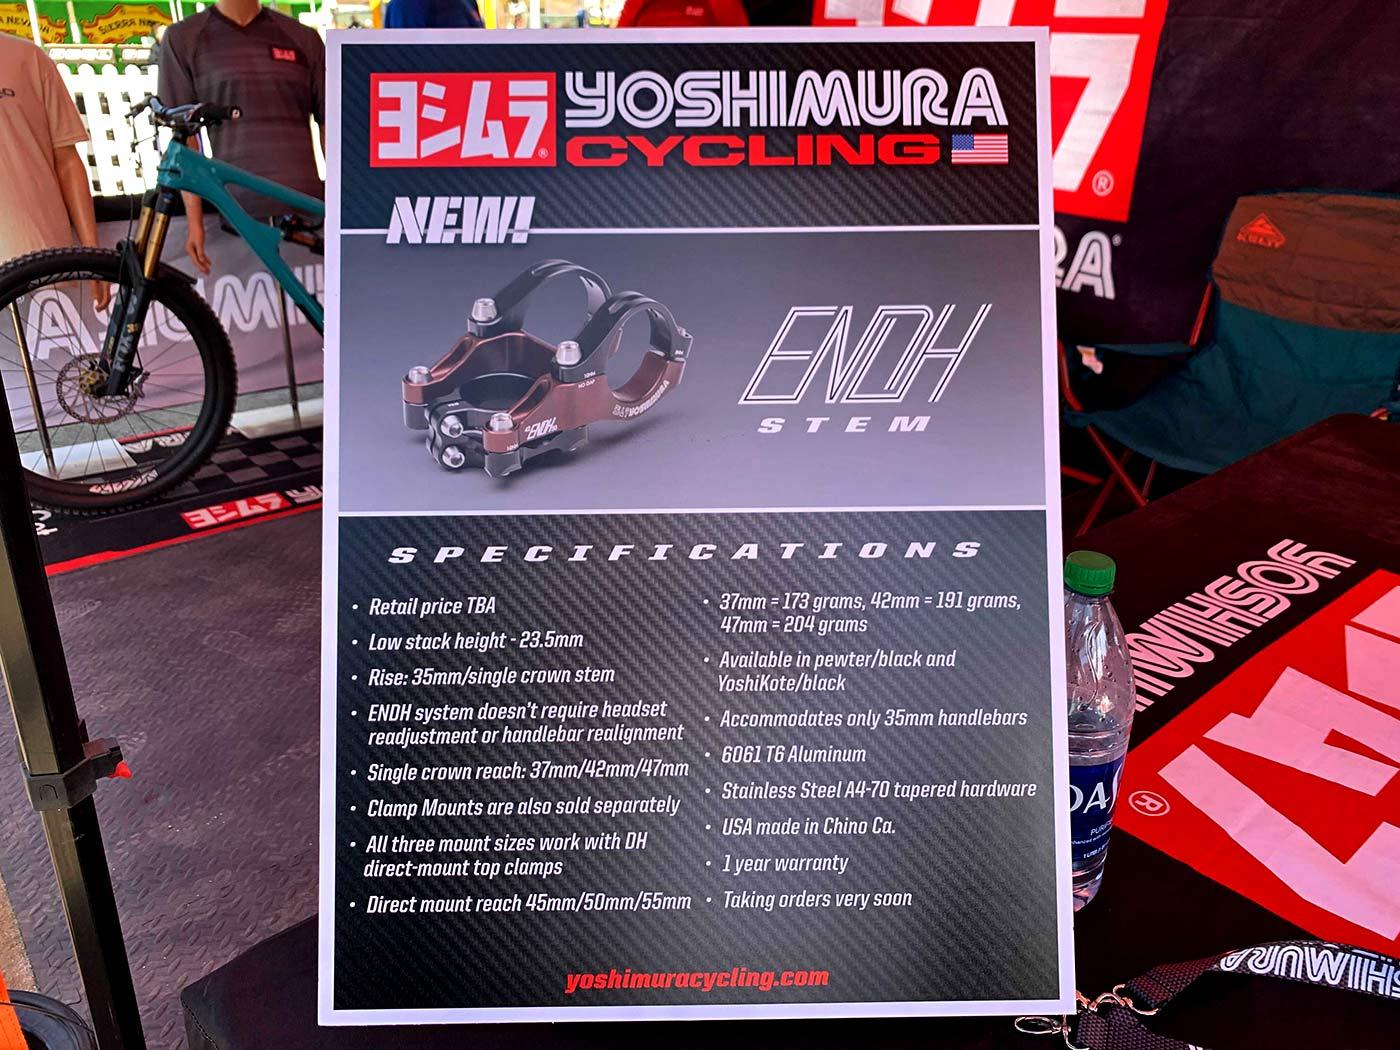 Yoshimura Enoh convertible mountain bike stem